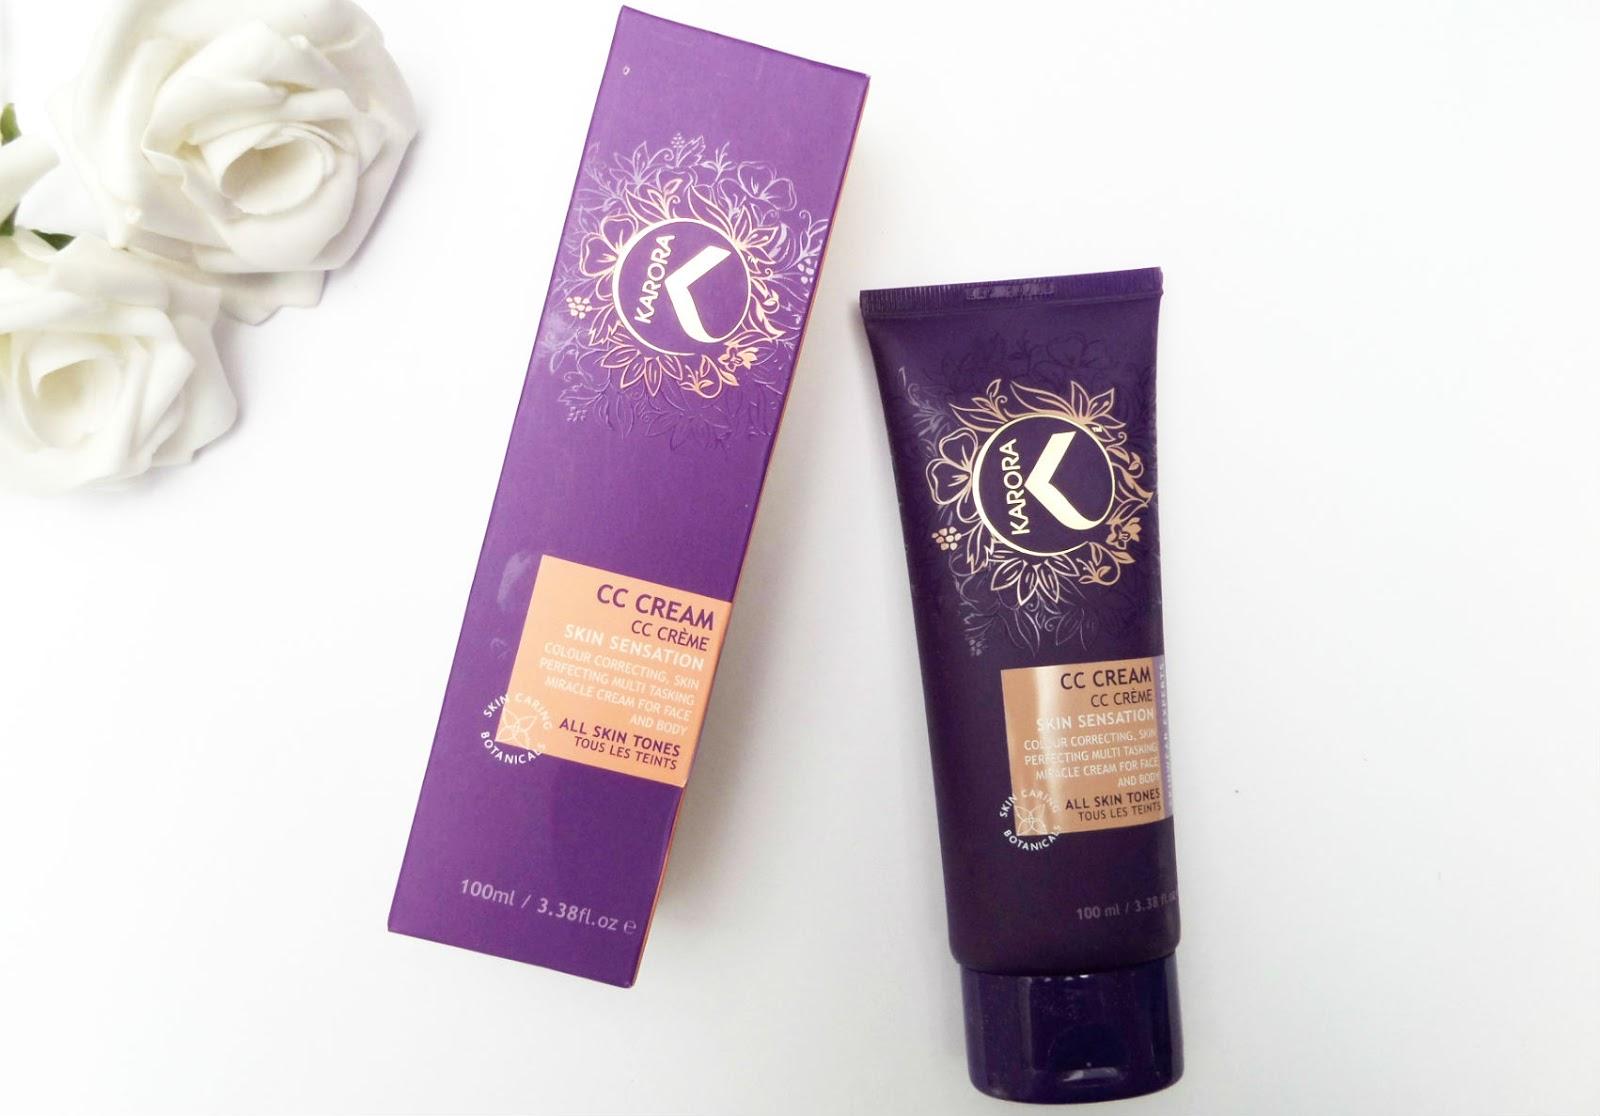 Karora Cosmetics Face And Body CC Cream Review